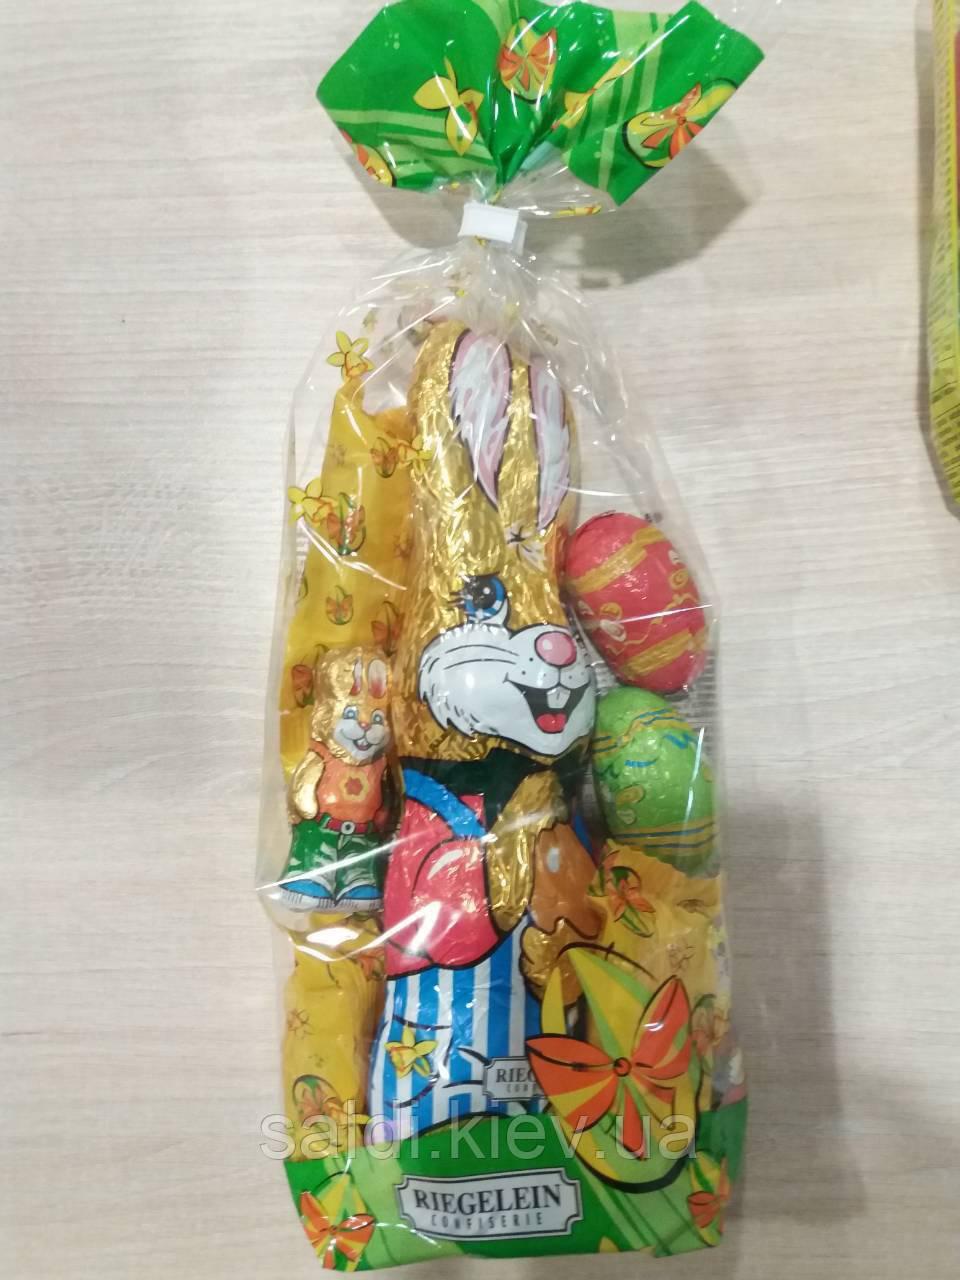 Шоколадный набор Riegelen заяц с подарком 250г